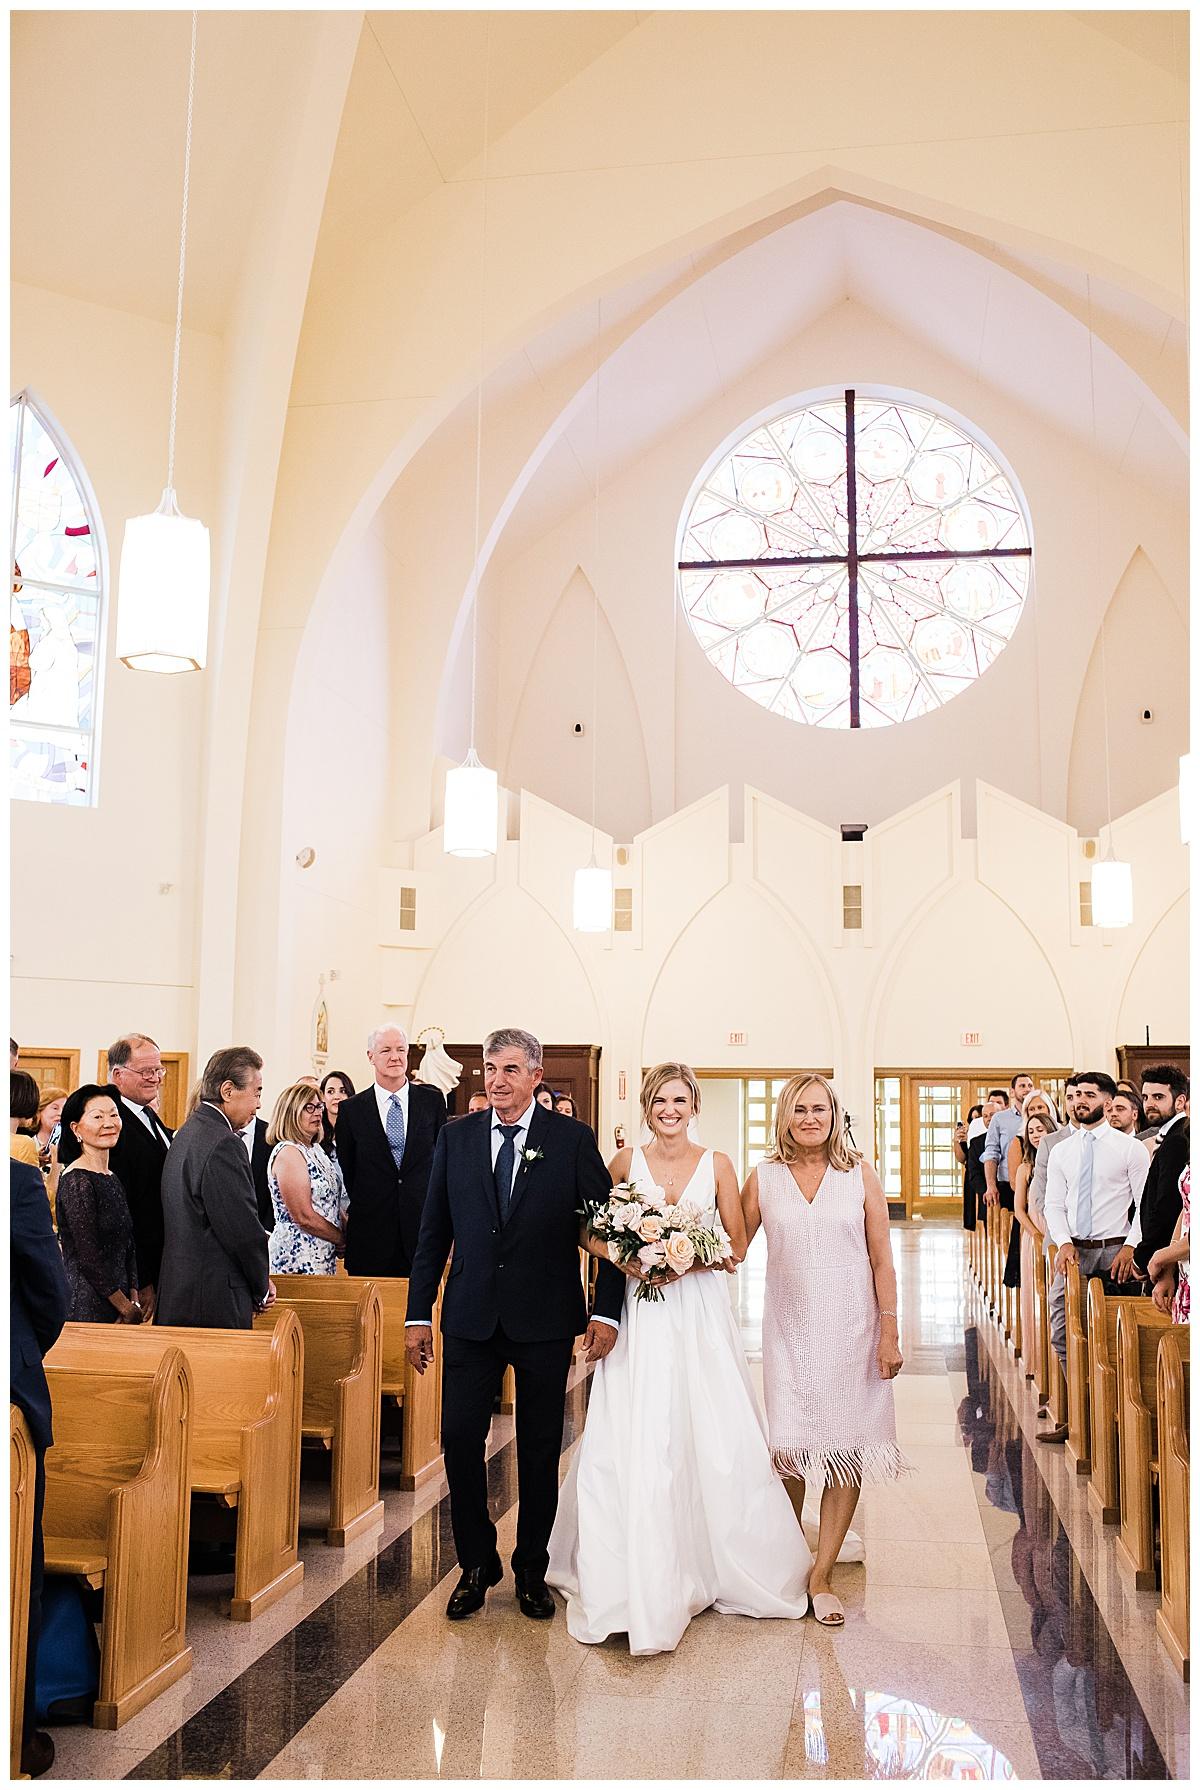 Bride walking down aisle with parents| Ontario wedding| Toronto wedding photography| 3photography